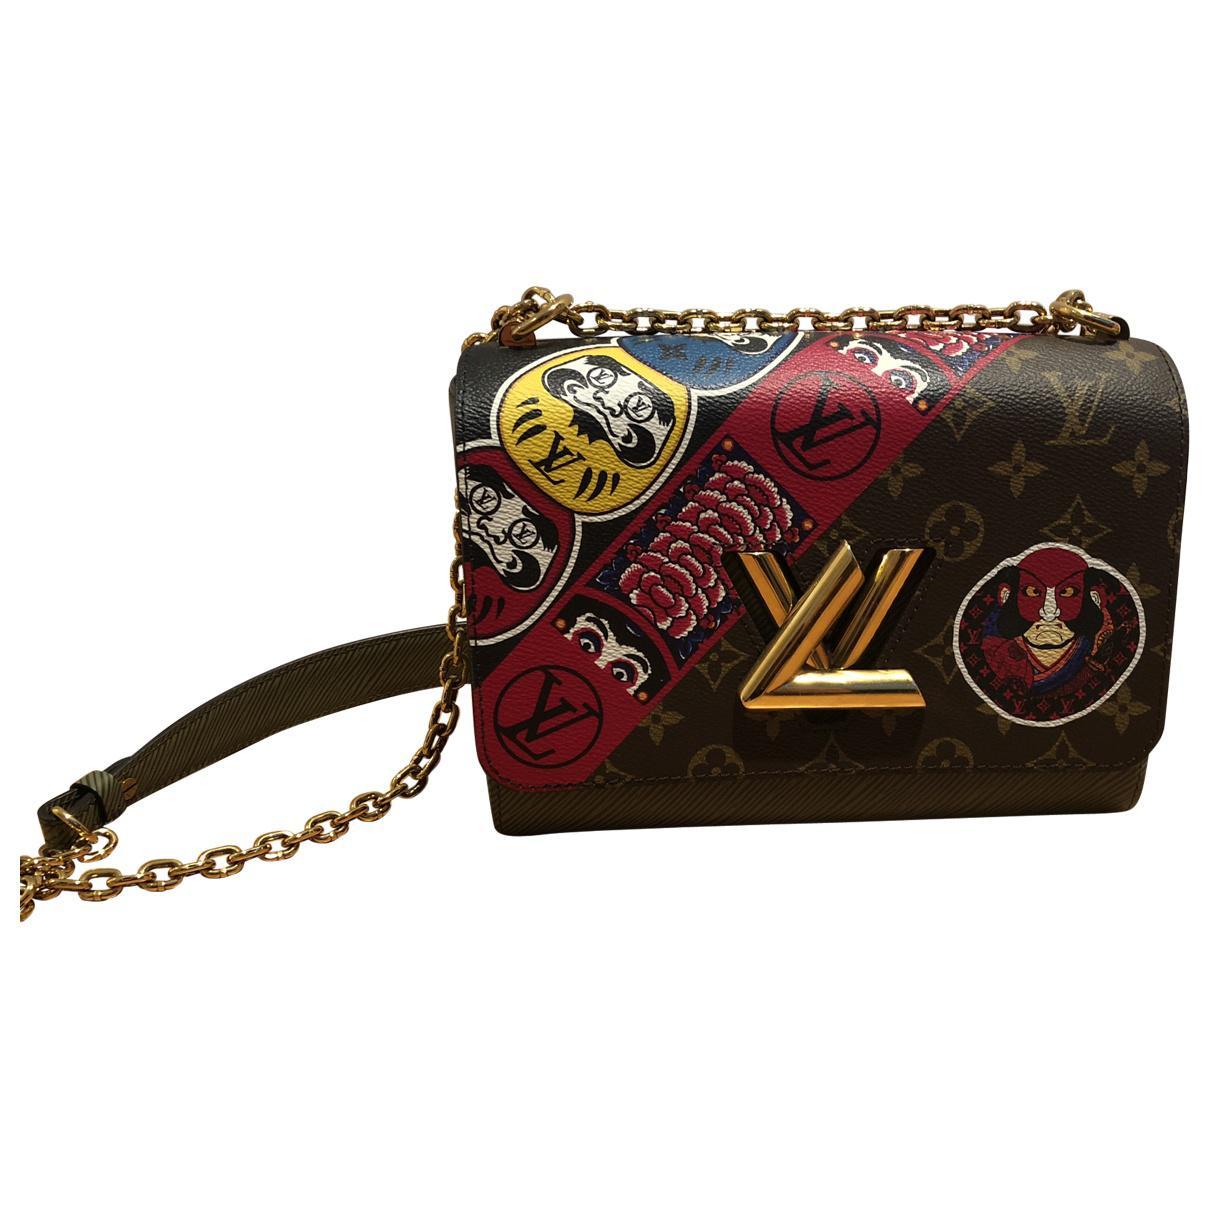 Louis Vuitton Pre-owned - Twist cloth handbag 4CgudYArB